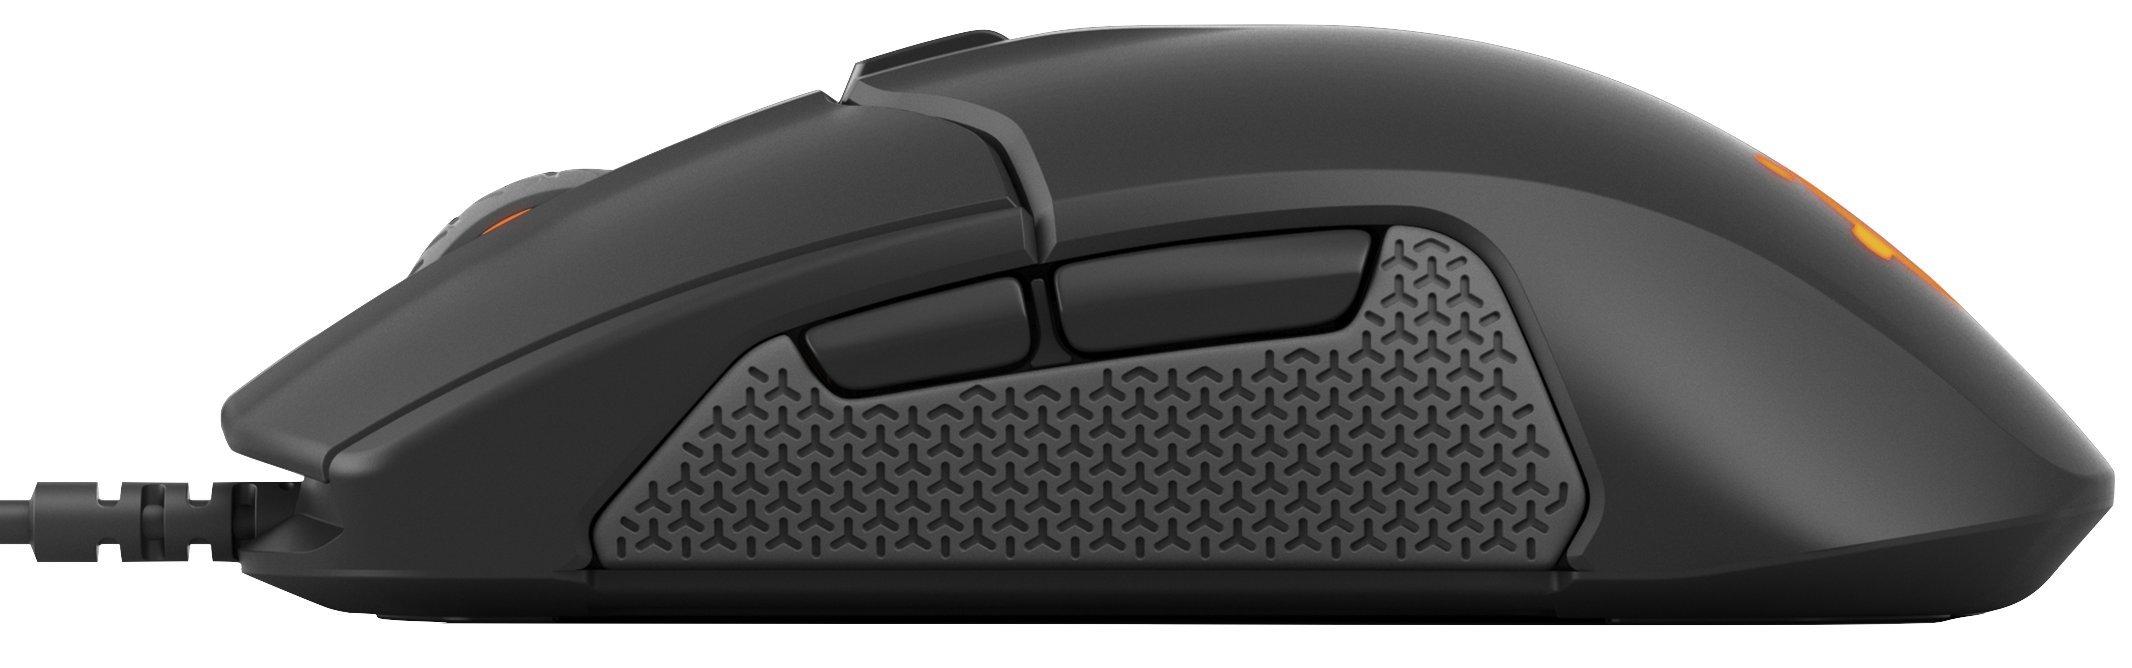 SteelSeries Sensei 310 Gaming Mouse - 12,000 CPI TrueMove3 Optical Sensor - Ambidextrous Design - Split-Trigger Buttons - RGB Lighting by SteelSeries (Image #5)